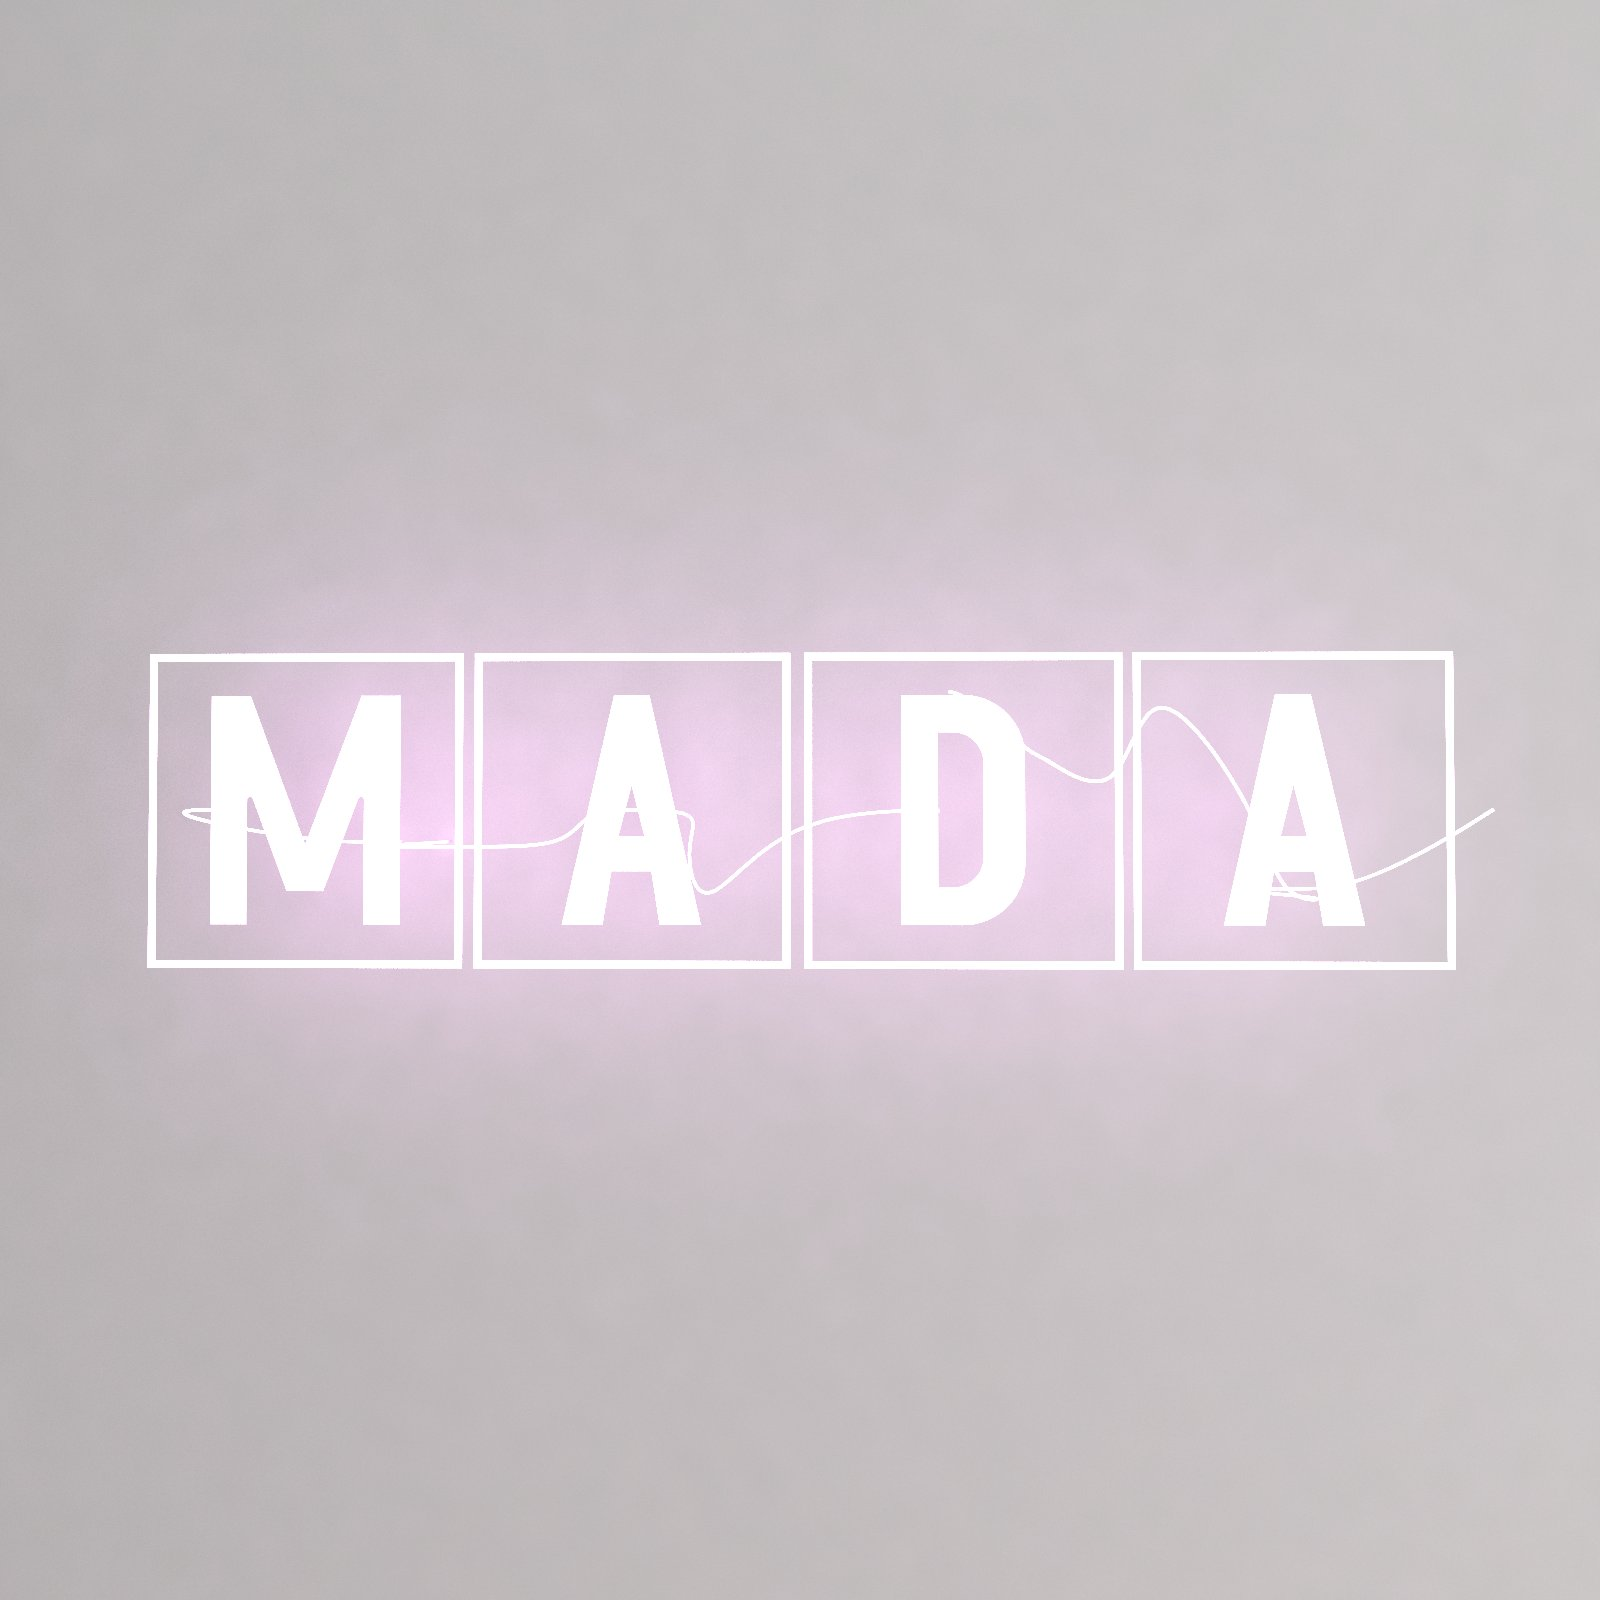 MIMAW MADA 1.jpg